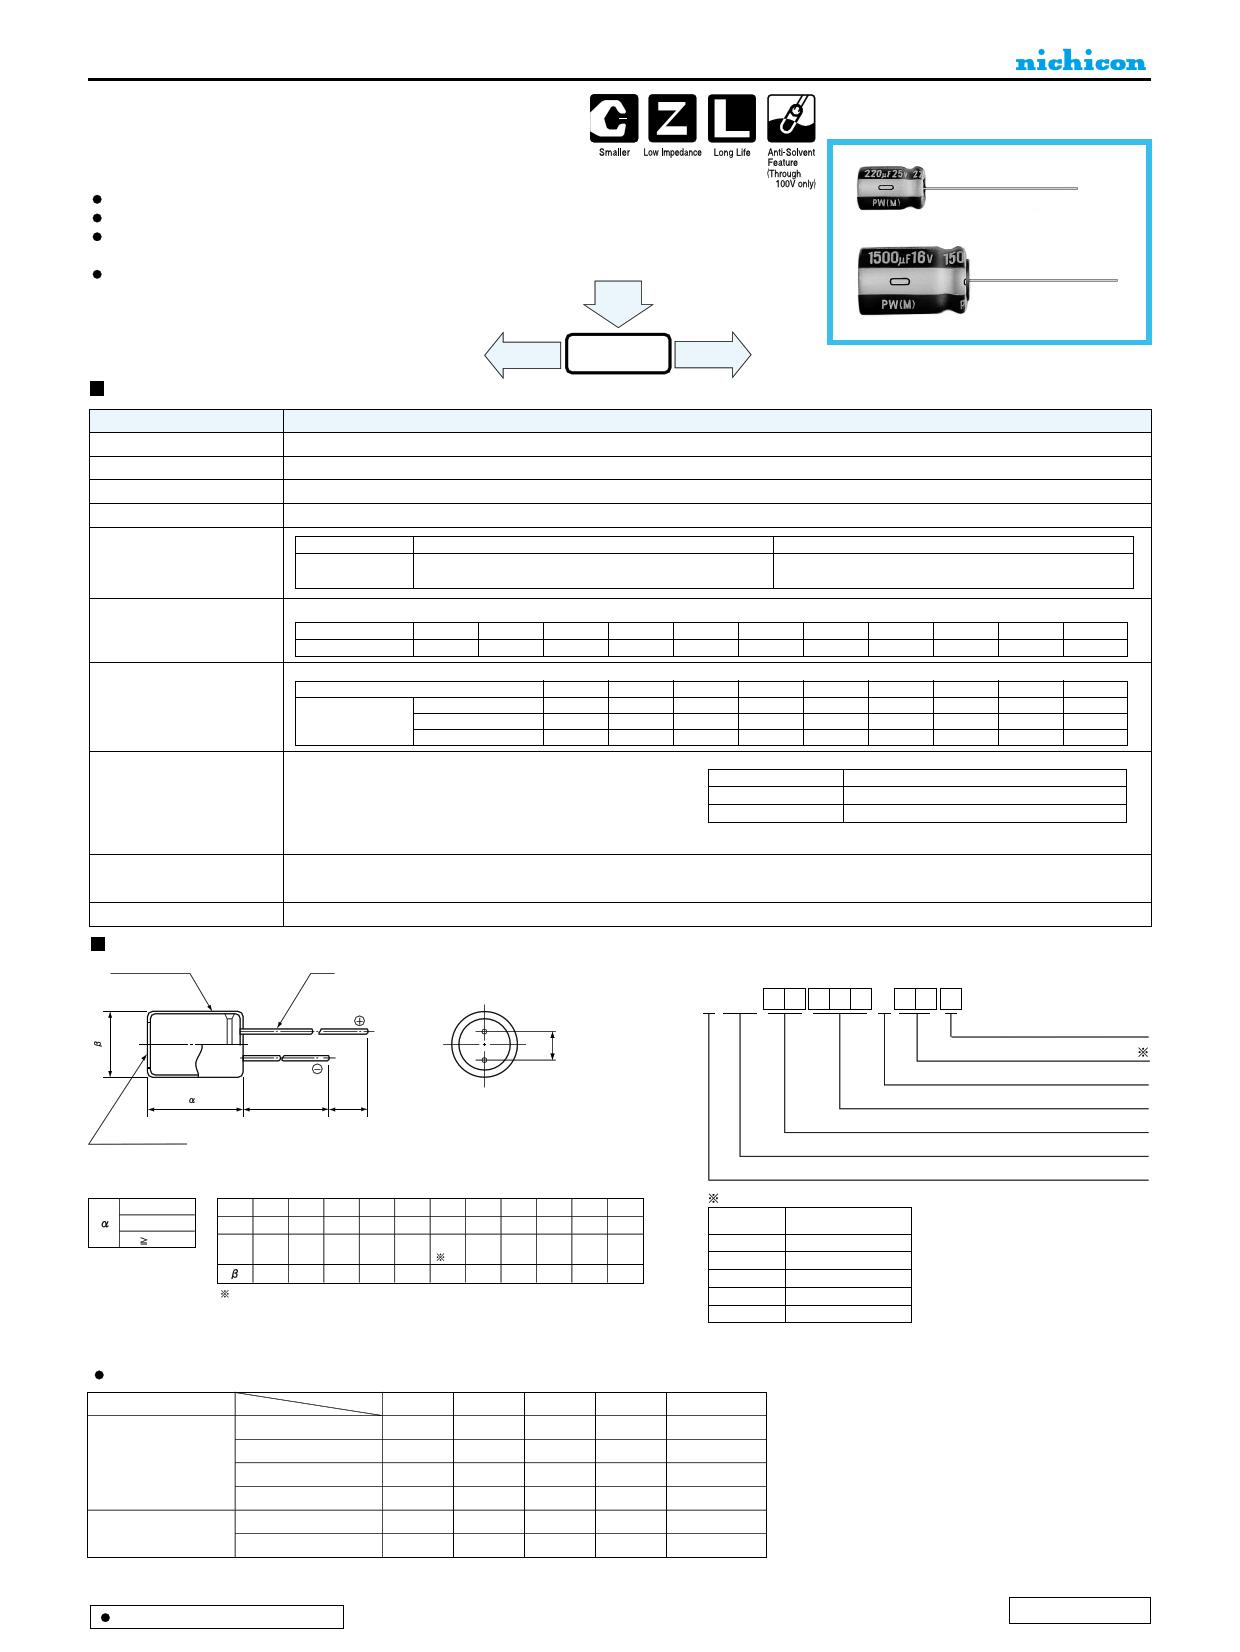 UPW1J102MHD 데이터시트 및 UPW1J102MHD PDF